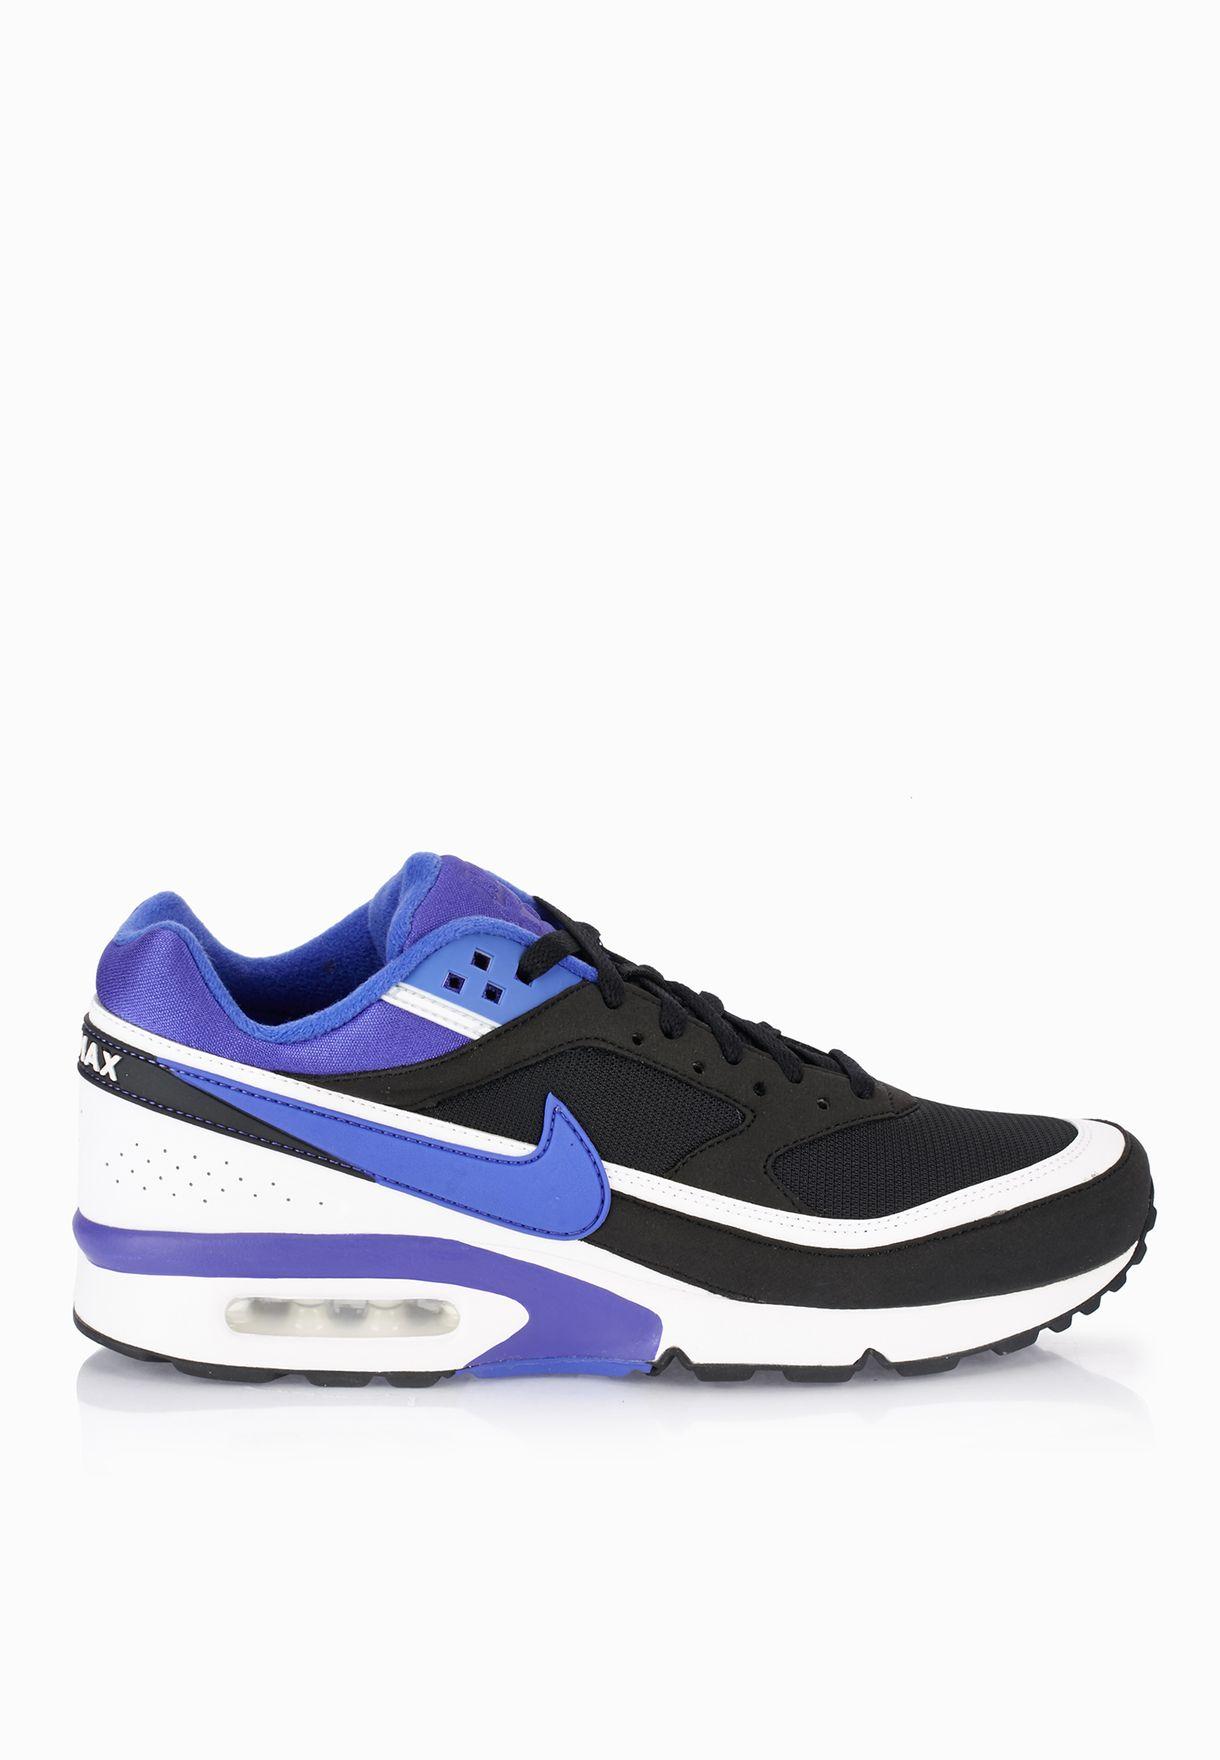 f391682a0b Shop Nike multicolor Air Max Bw OG 819522-051 for Men in Kuwait ...